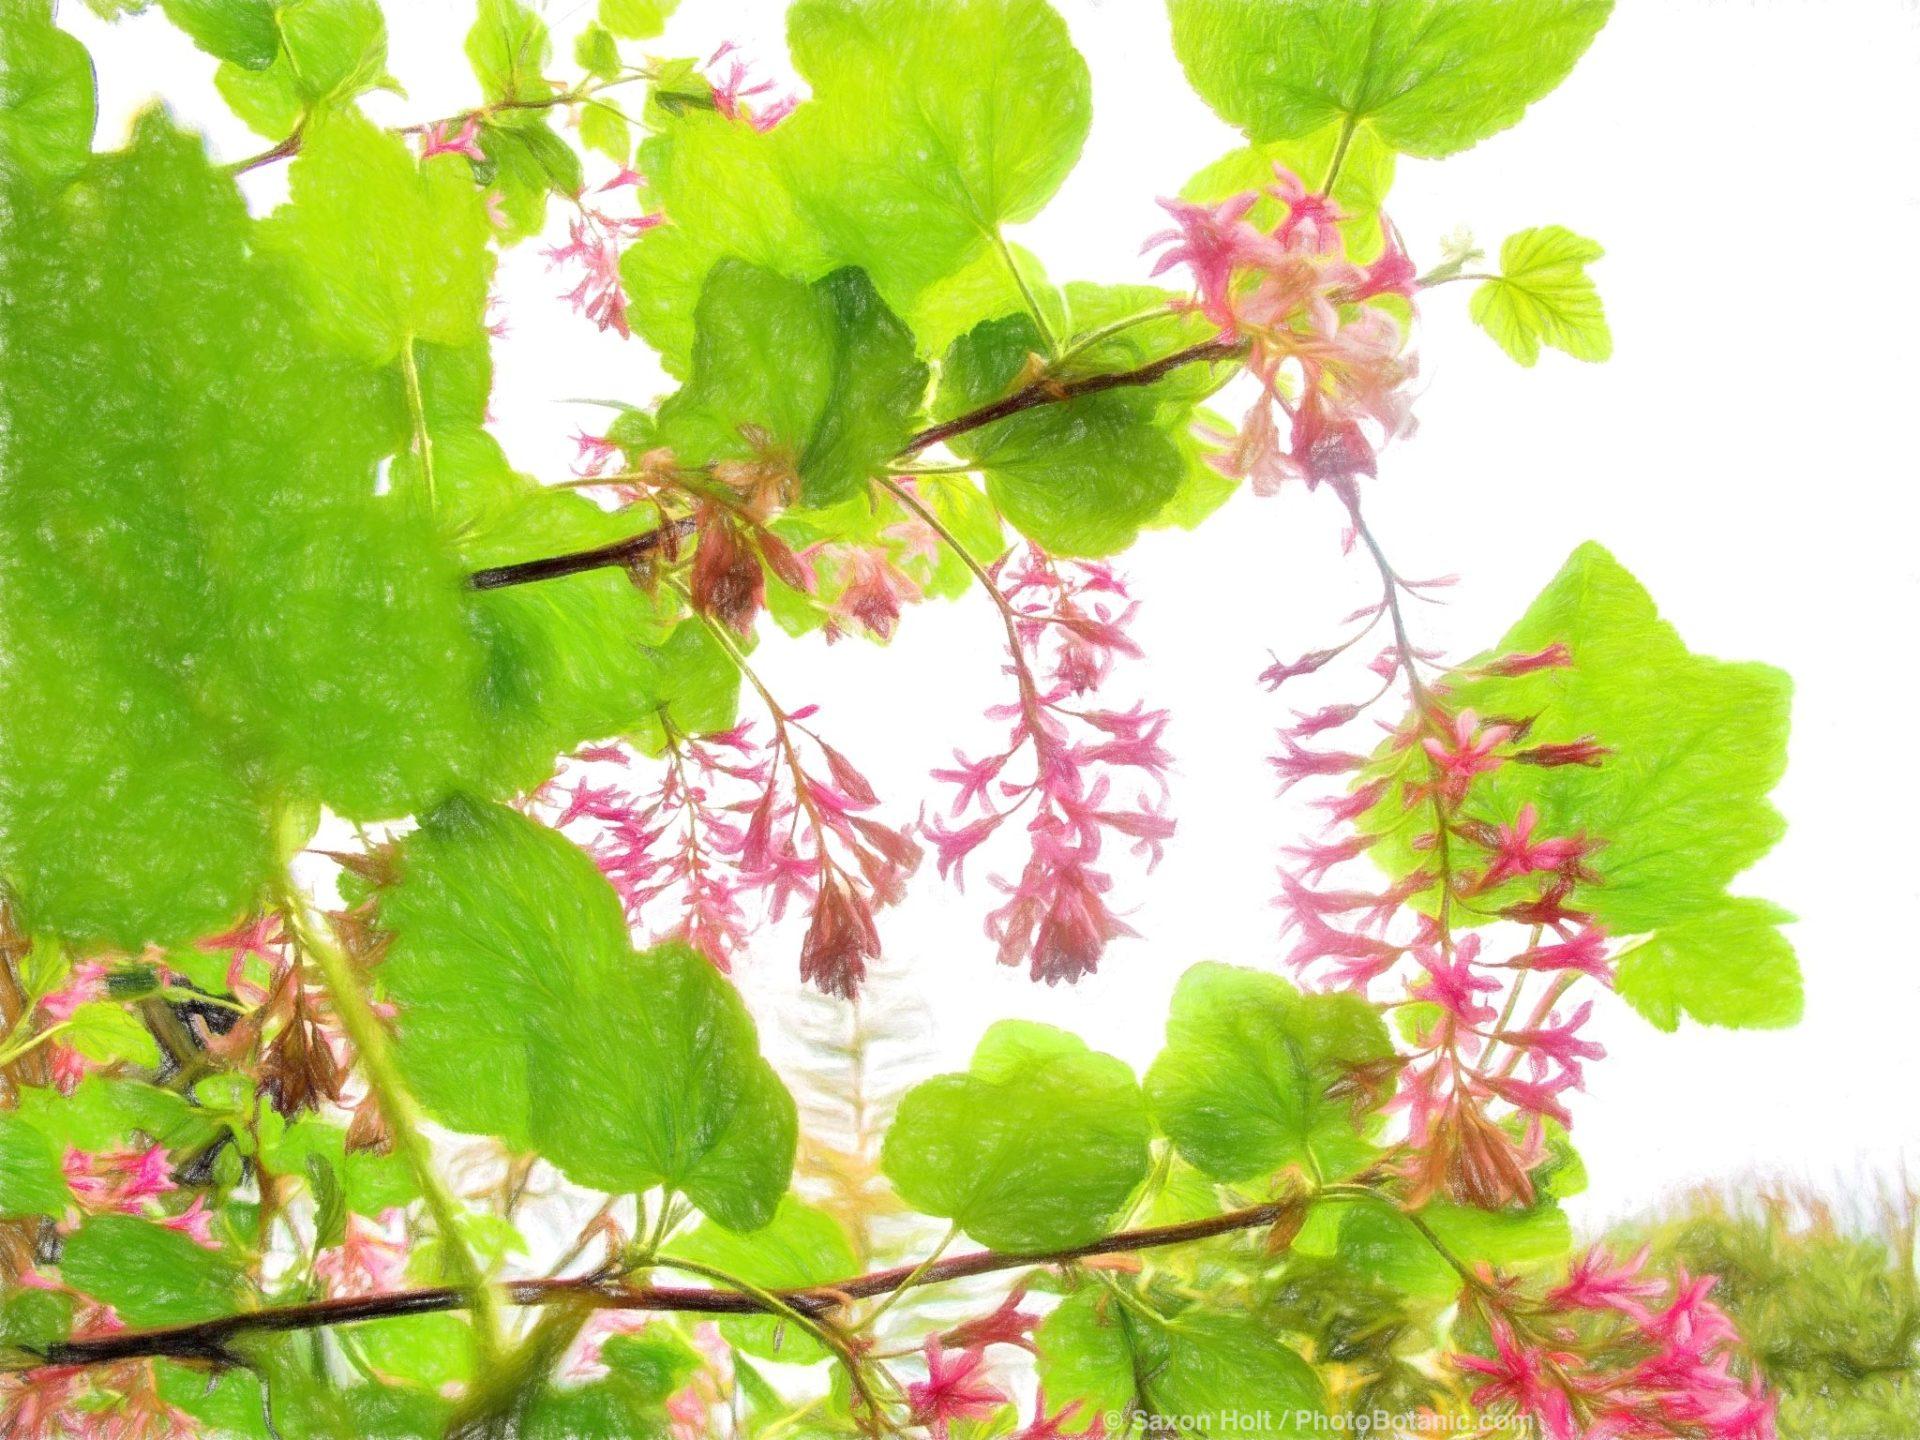 Ribes sanguineum, California curant flowering in California spring garden